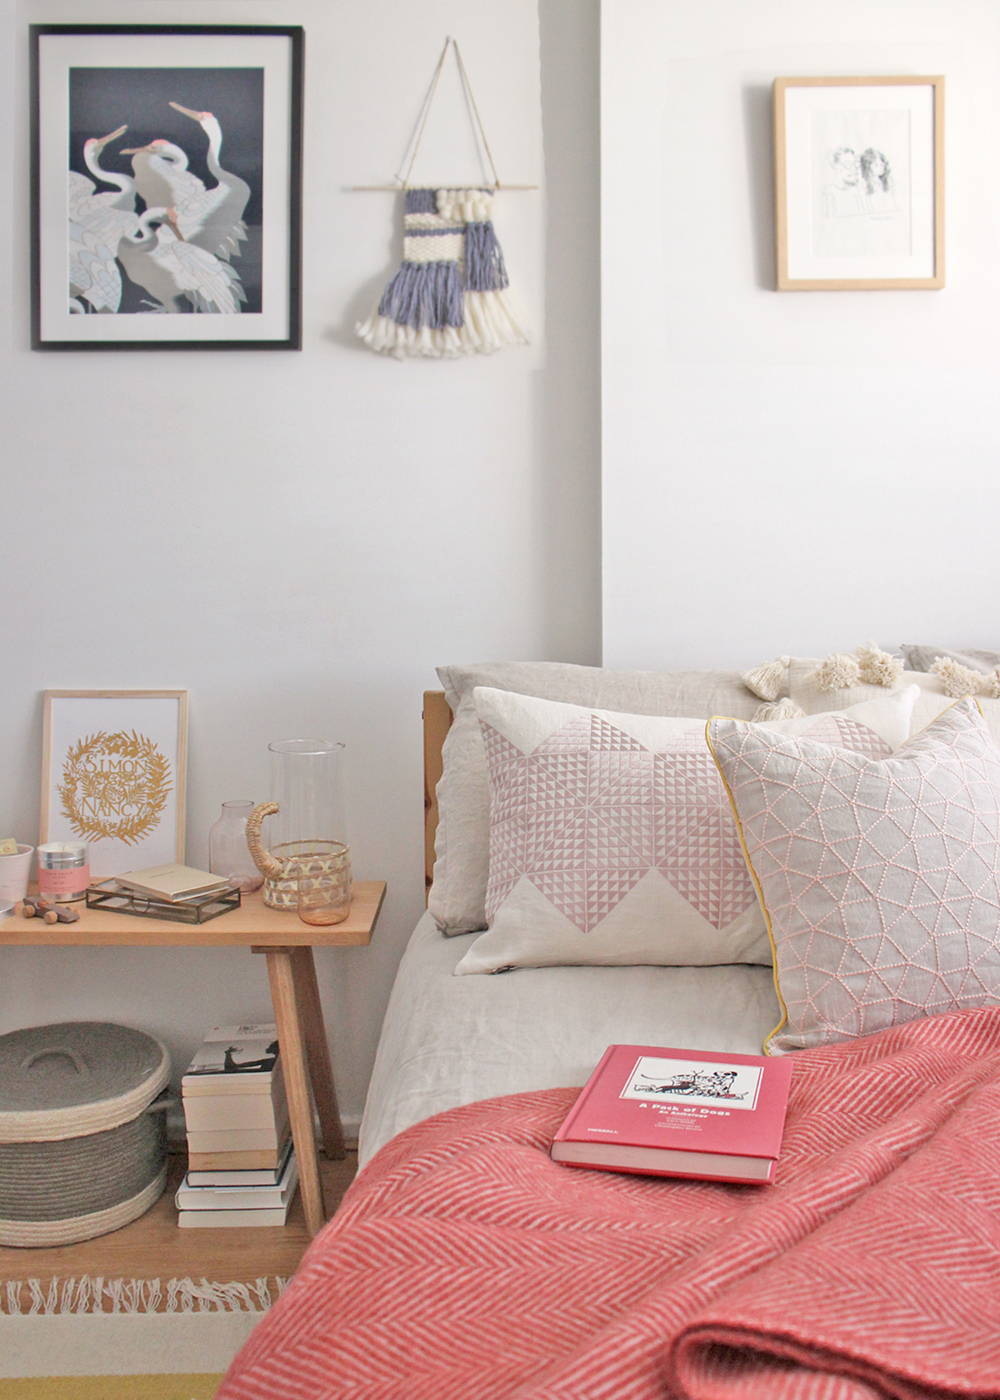 Nancy-straughan-interior-stylist-amara-small-bedroom-pink.jpg